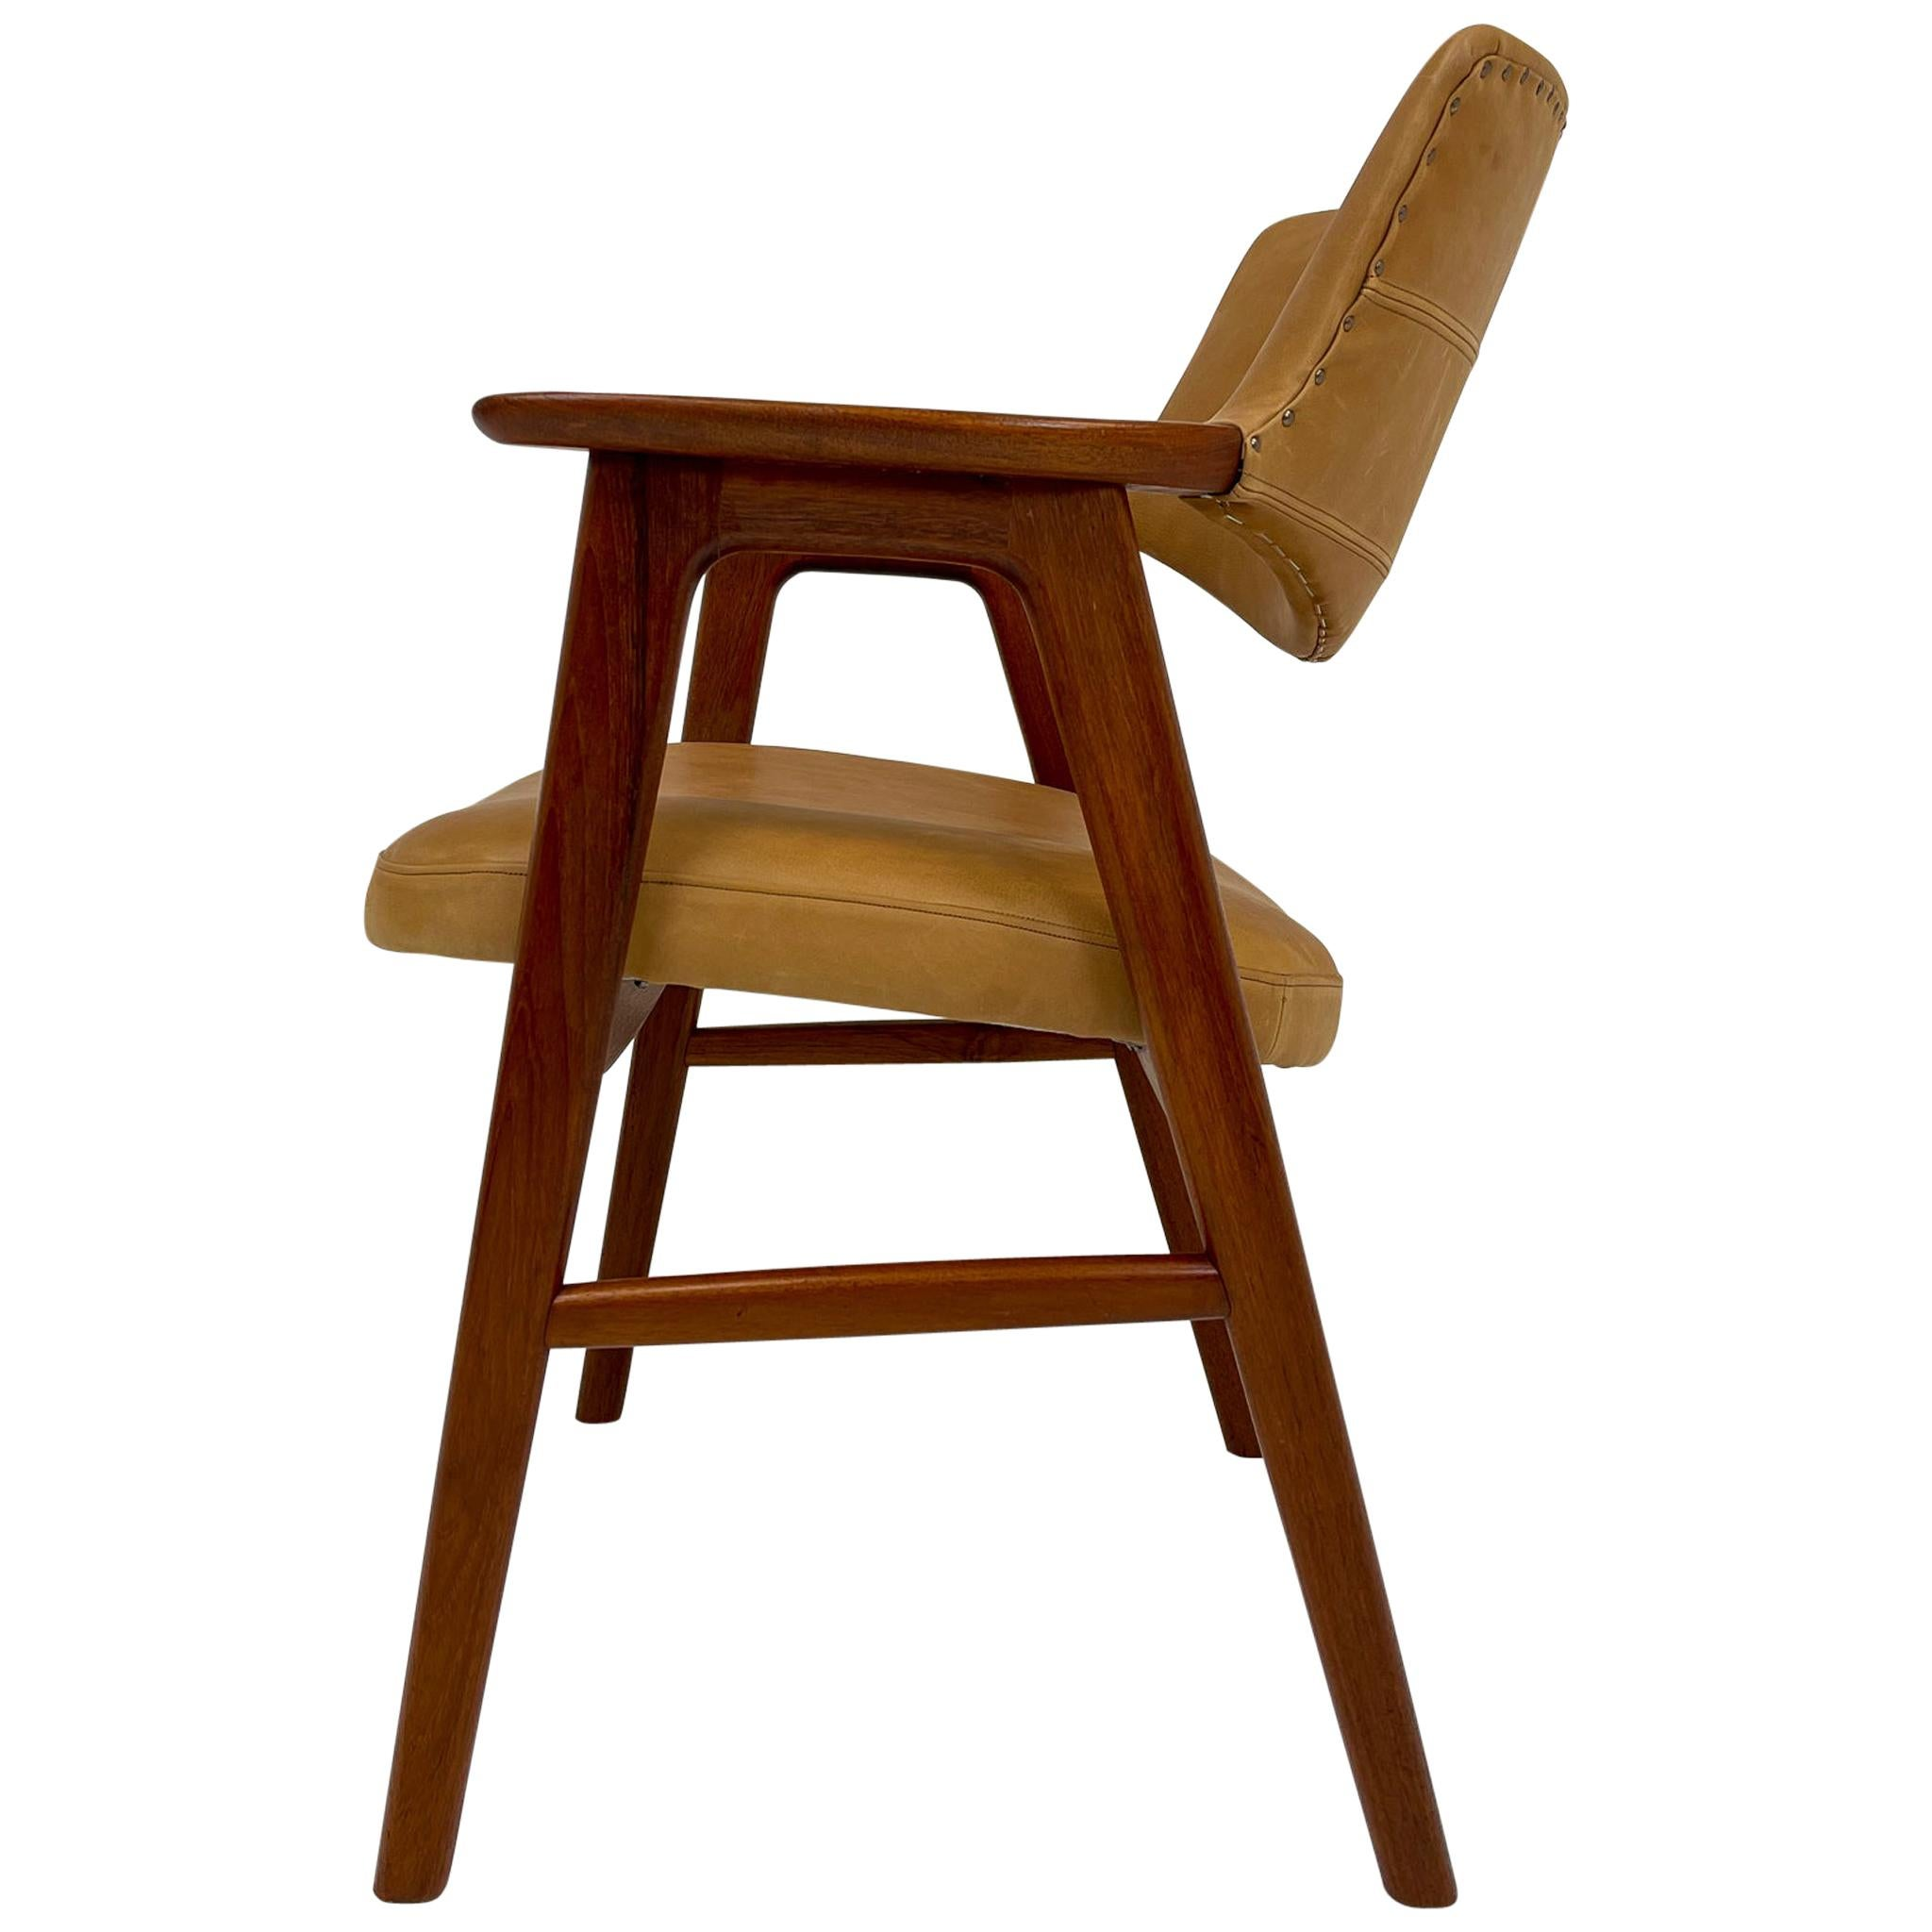 Midcentury Erik Kirkegaard Danish Teak and Leather Desk Chair, 1960s